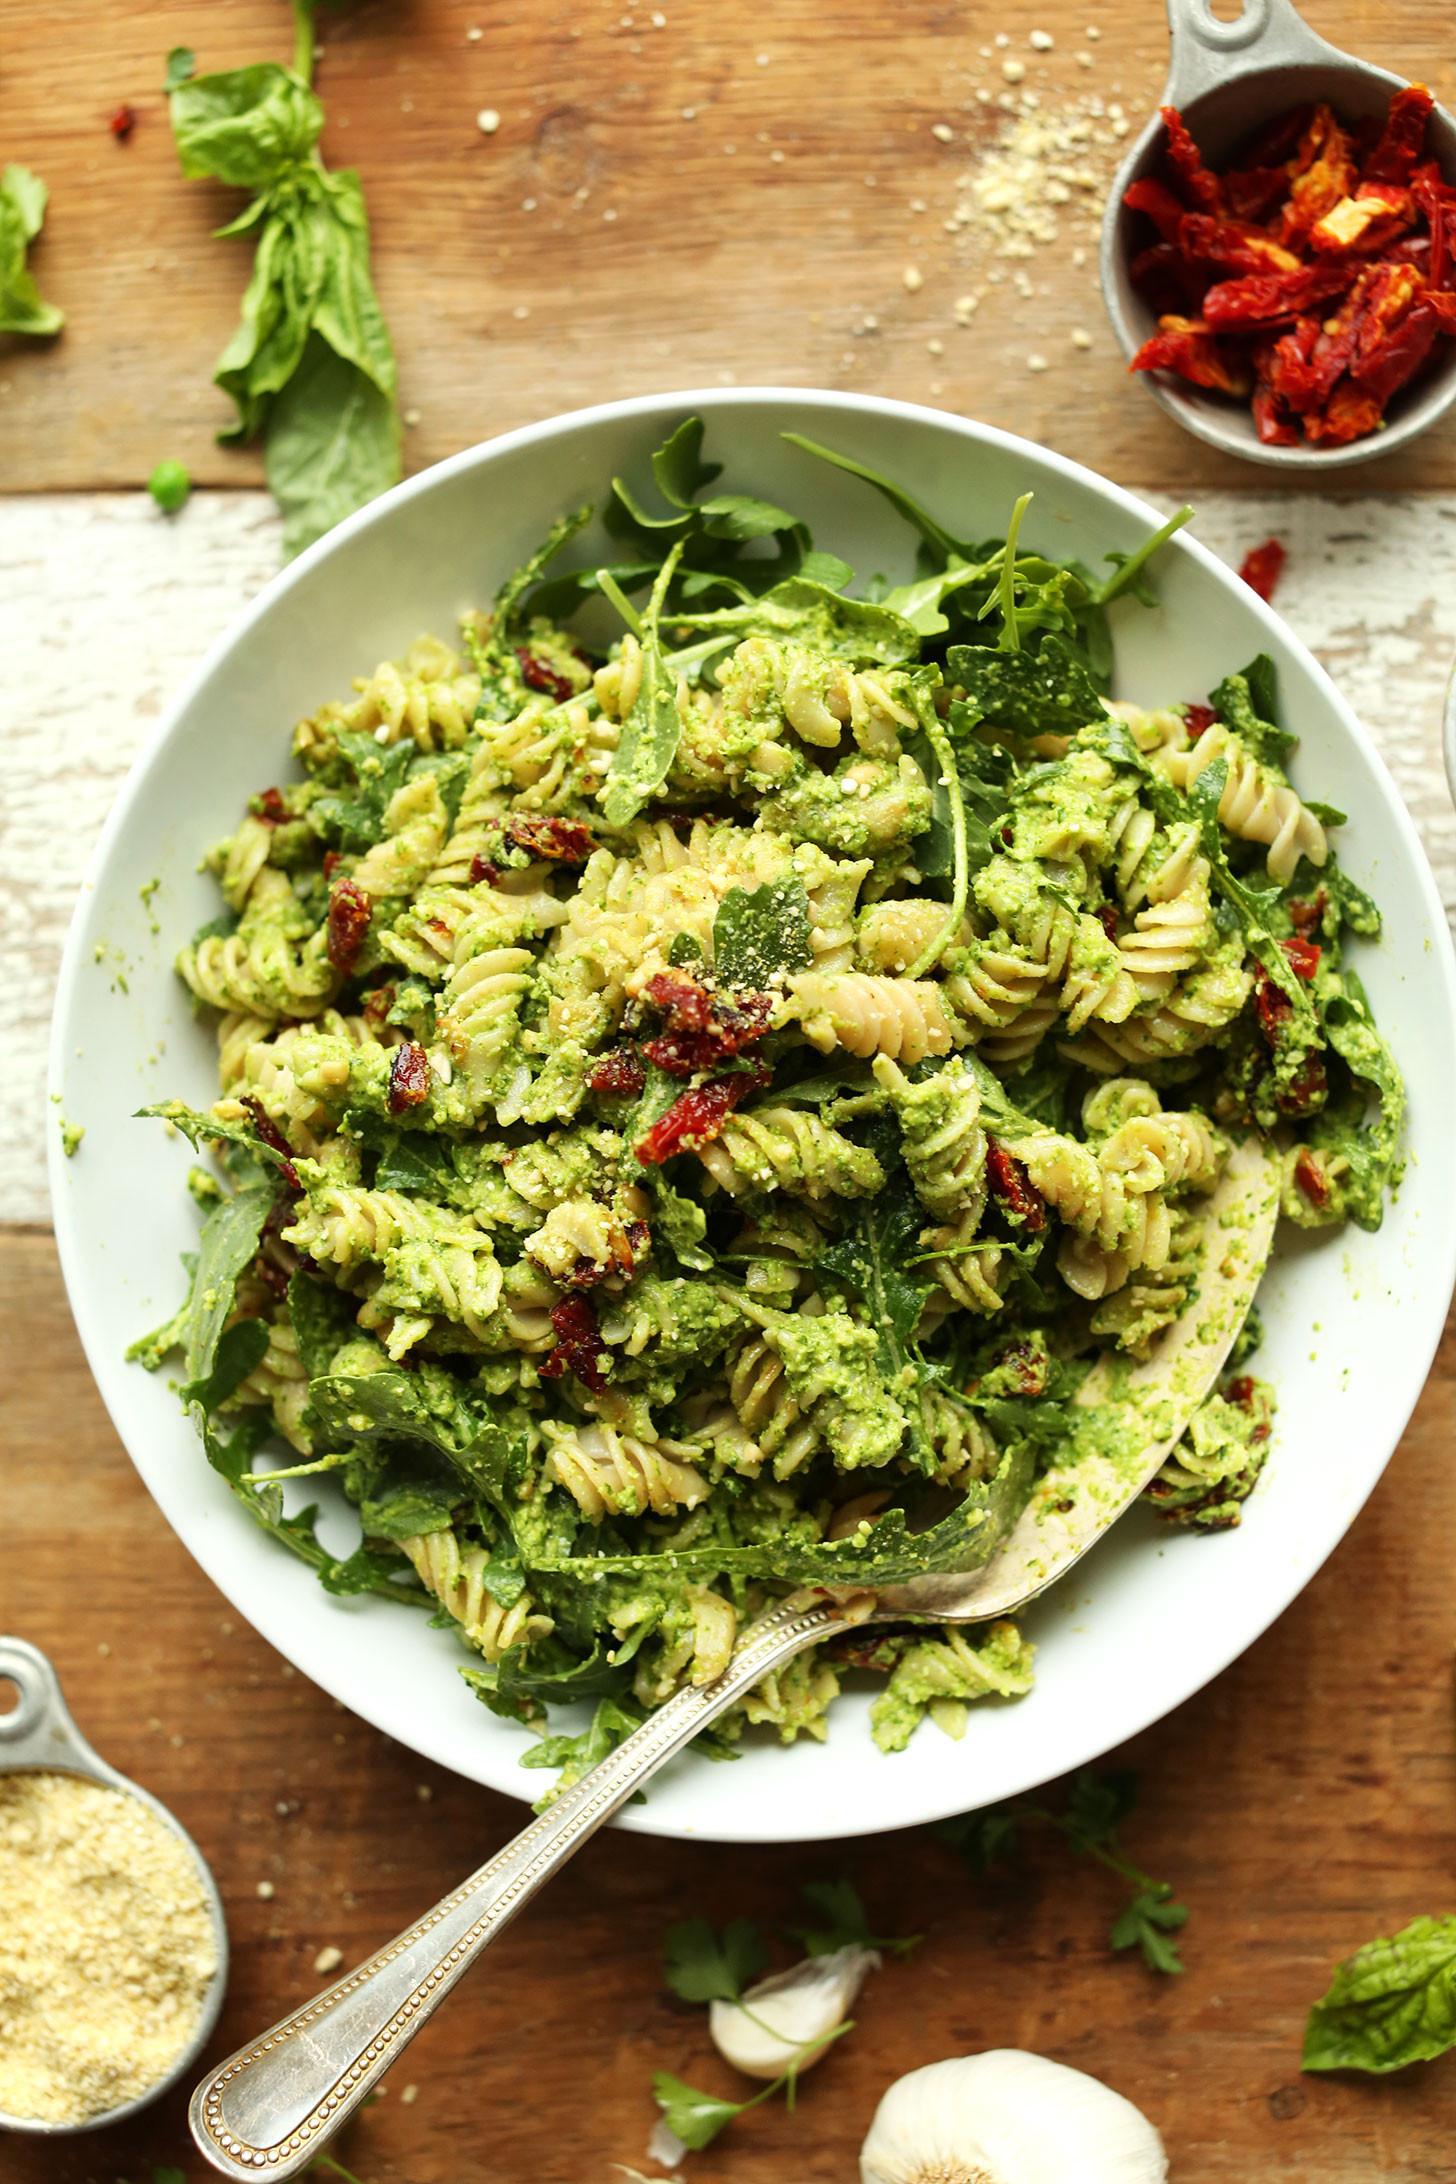 Healthy Vegetarian Pasta Recipes  Pea Pesto Pasta with Sun Dried Tomatoes